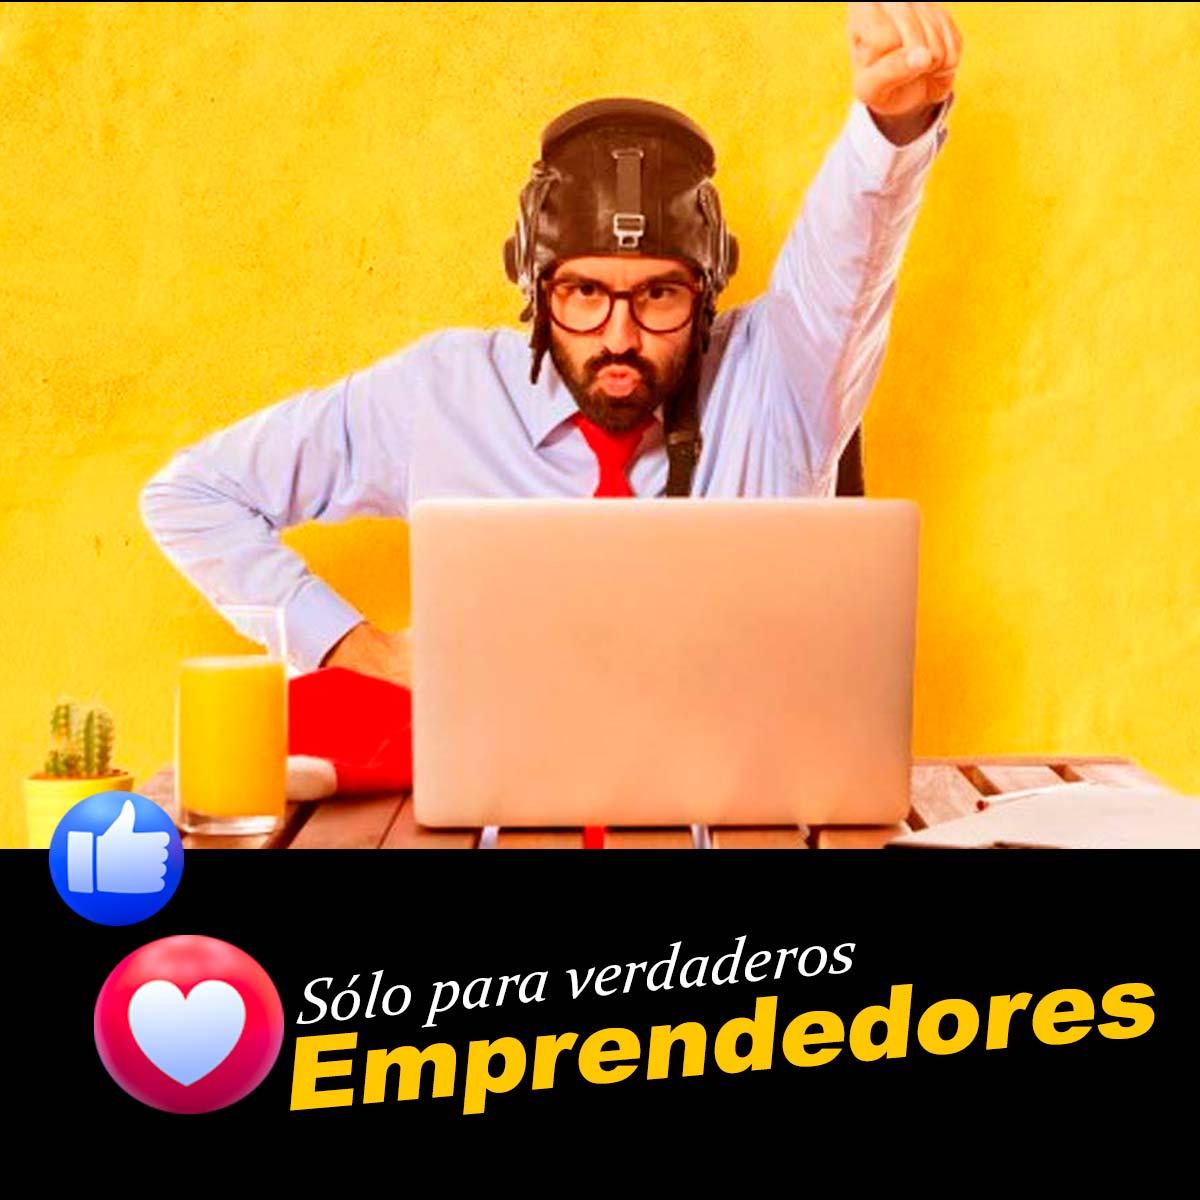 ¡Overflow Emprende - Sólo para Verdaderos Emprendedores como tú!